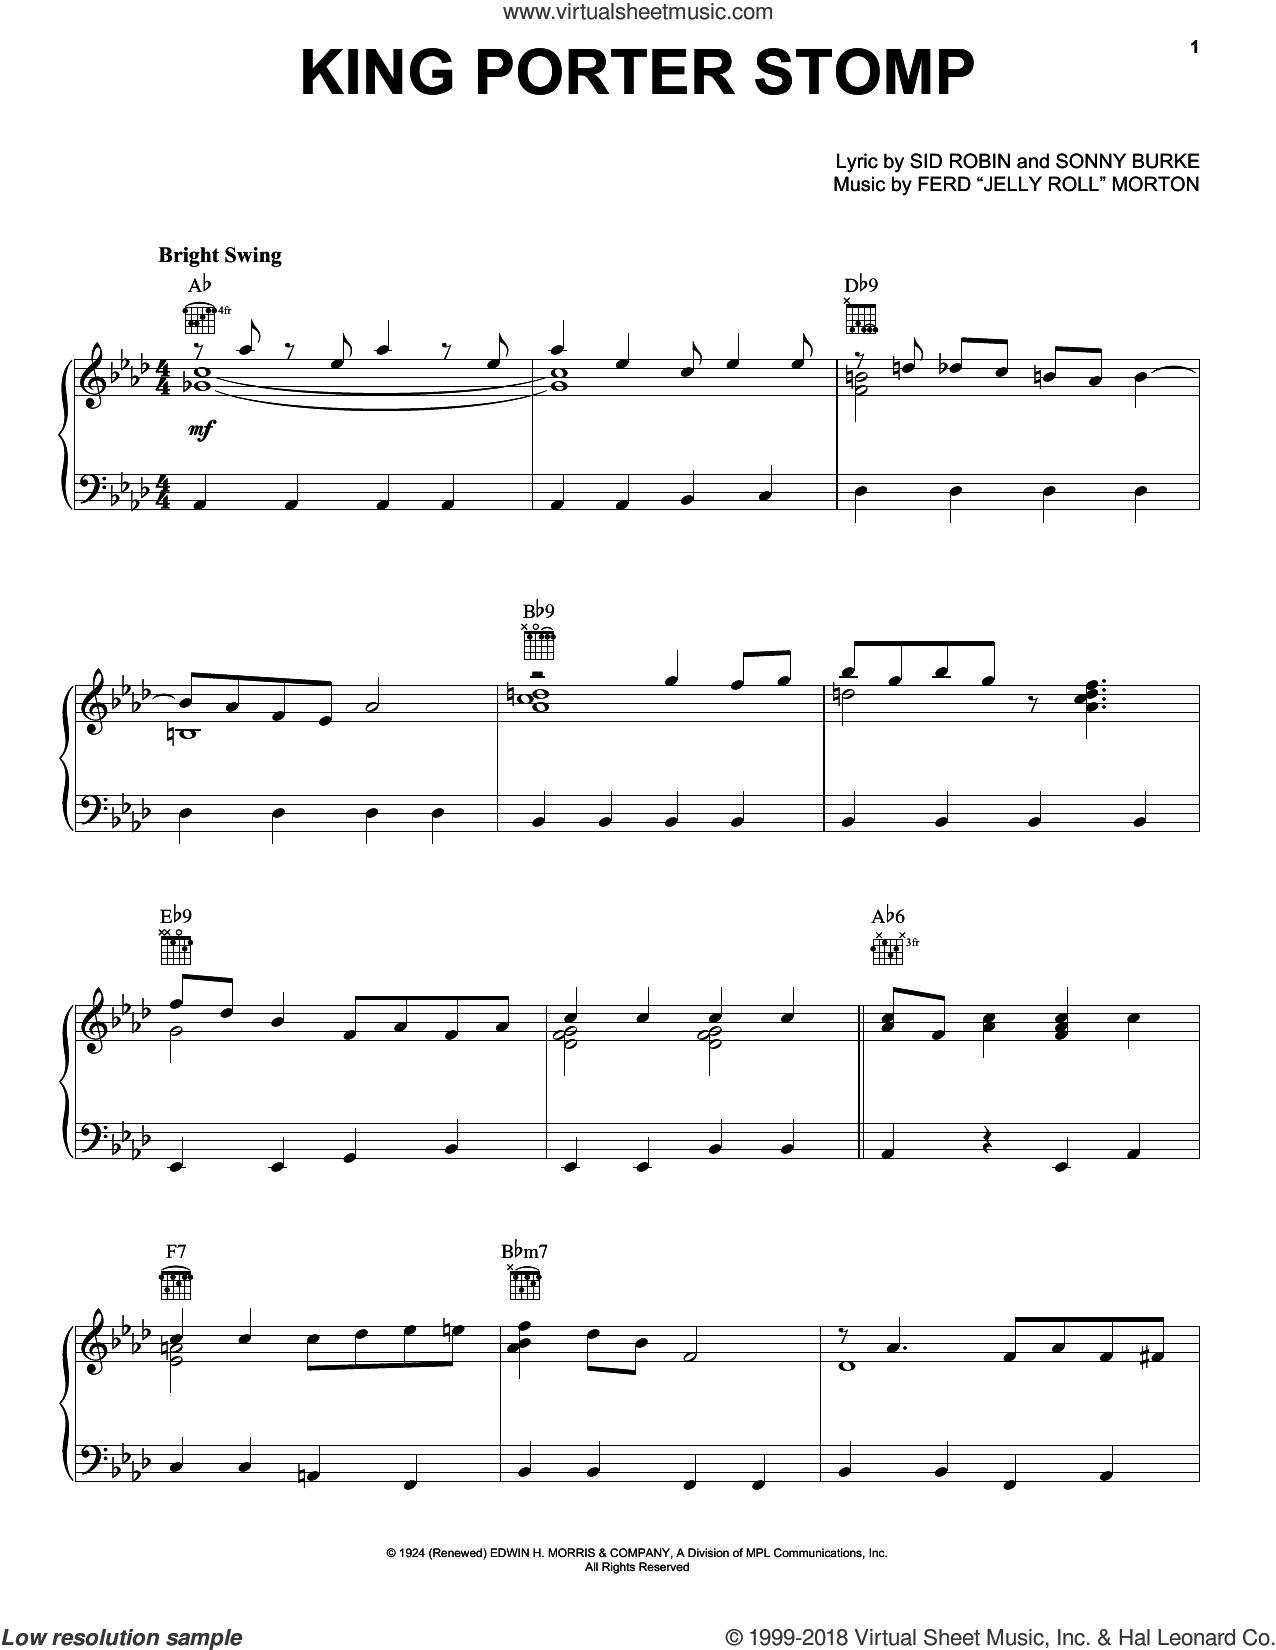 King Porter Stomp sheet music for piano solo by Jelly Roll Morton, Benny Goodman, Count Basie, Fletcher Henderson, Glenn Miller, Harry James, Ferd 'Jelly Roll' Morton, Sid Robin and Sonny Burke, intermediate skill level